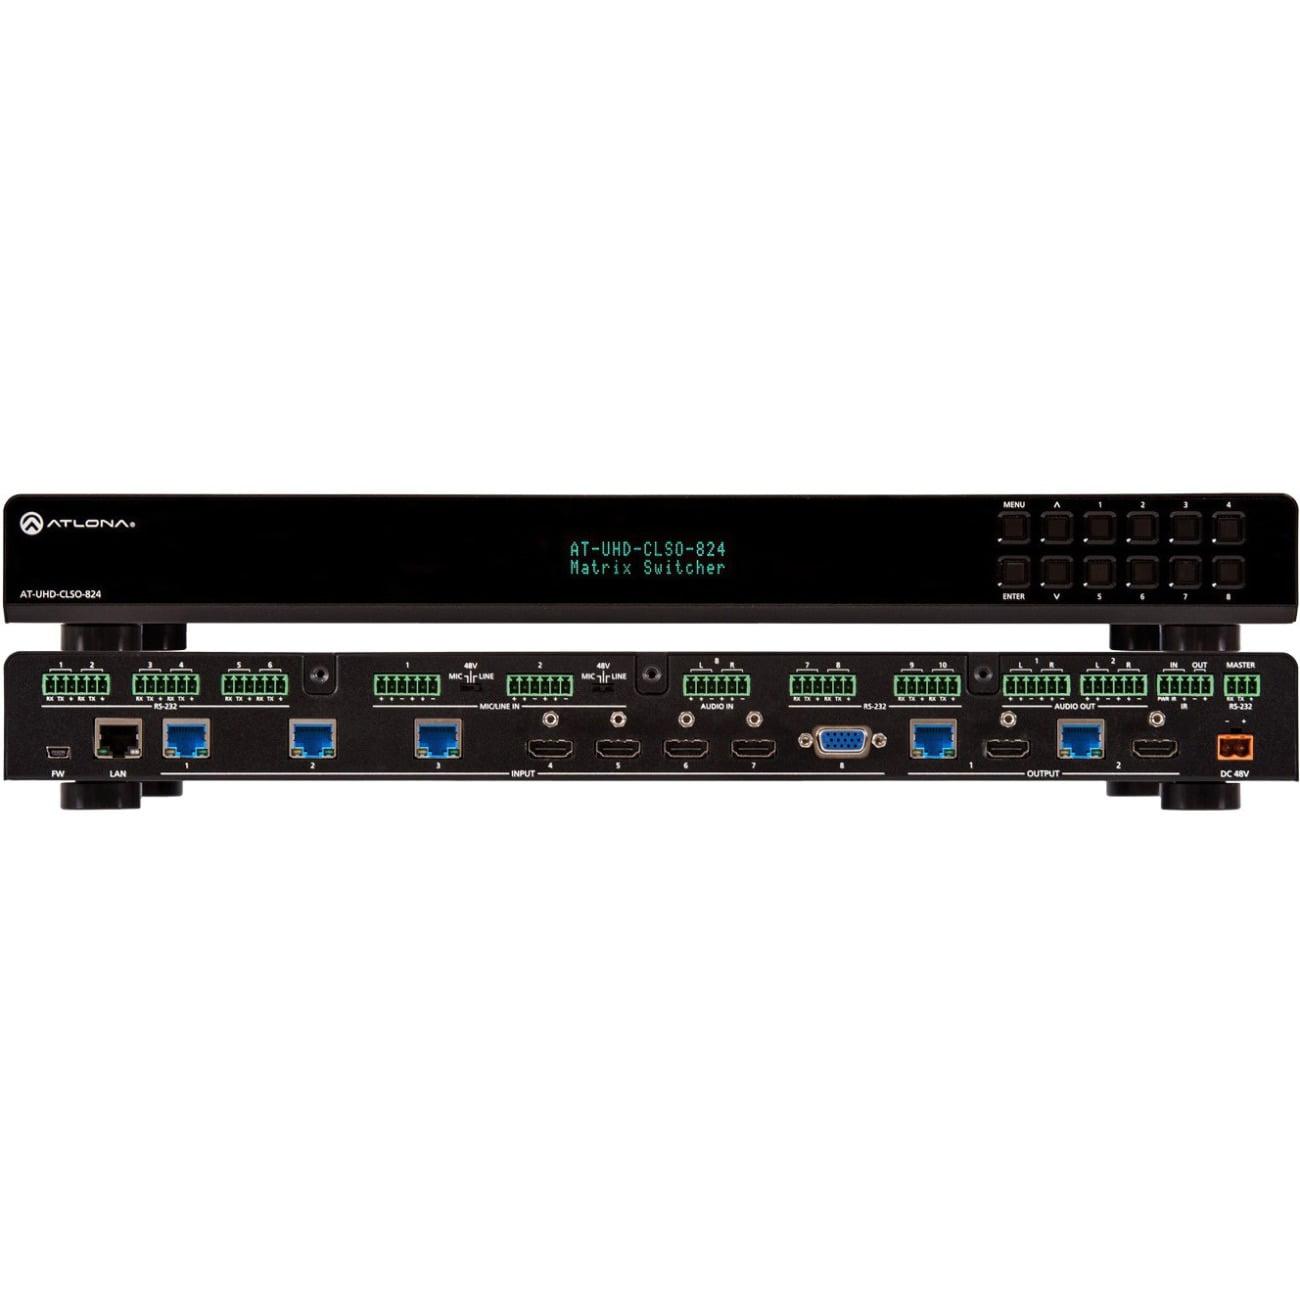 4K/UHD 8��2 Matrix with HDBaseT and HDMI Outputs